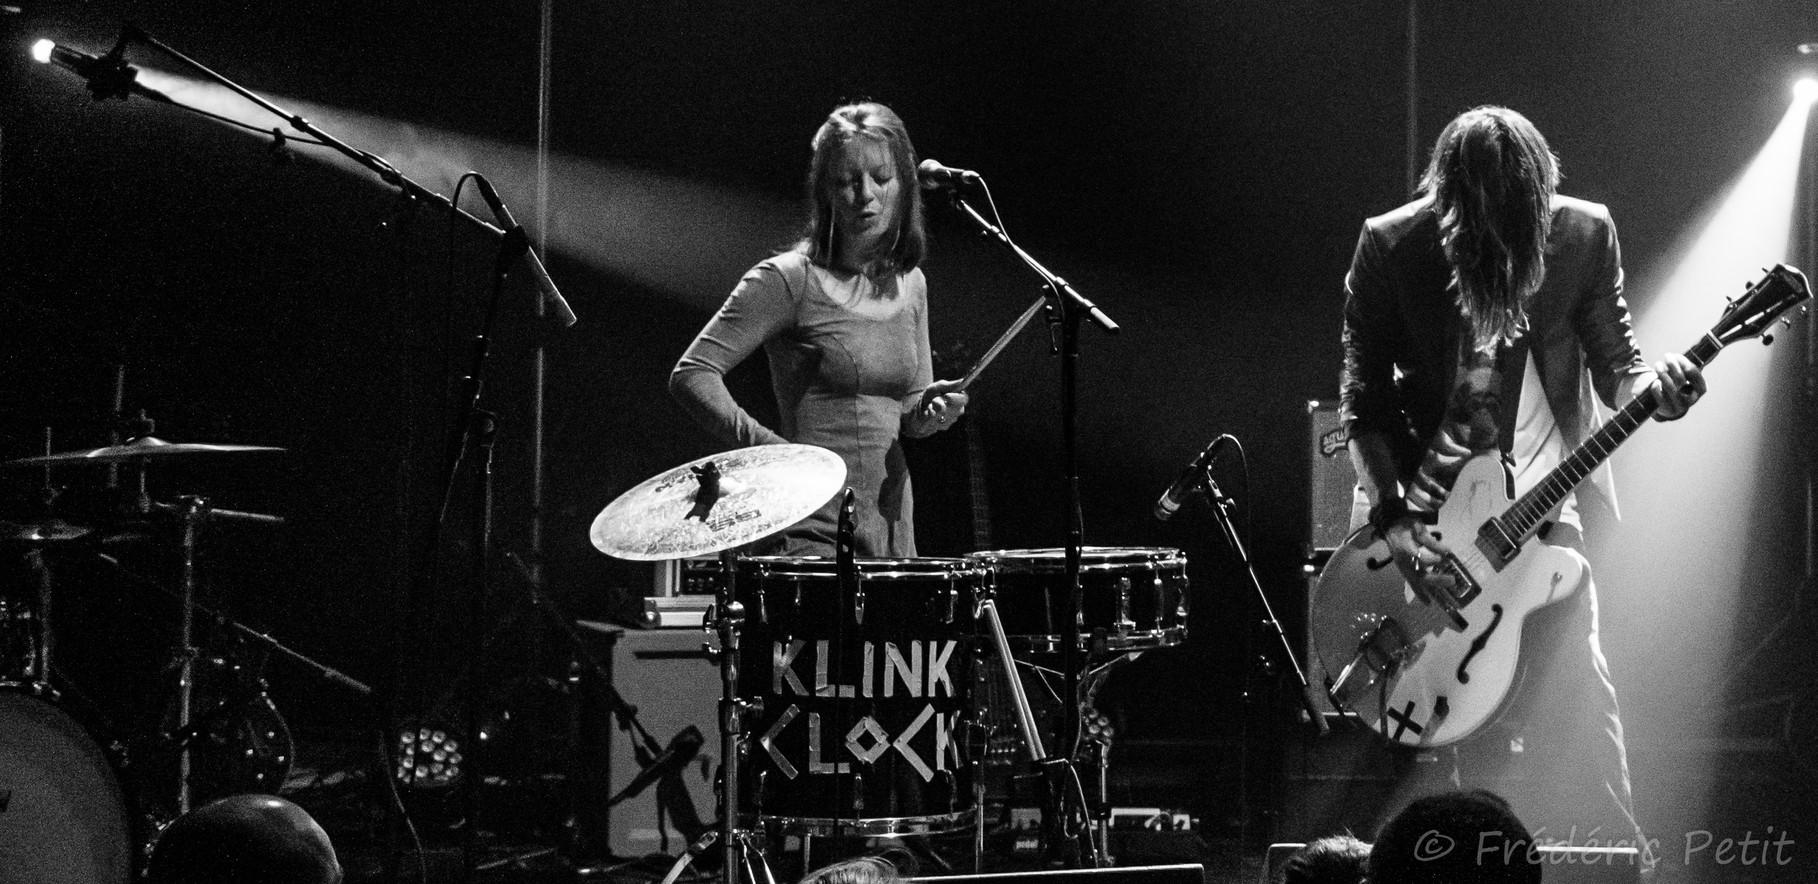 14 juin 2014 - Klink Clock @ L'Empreinte